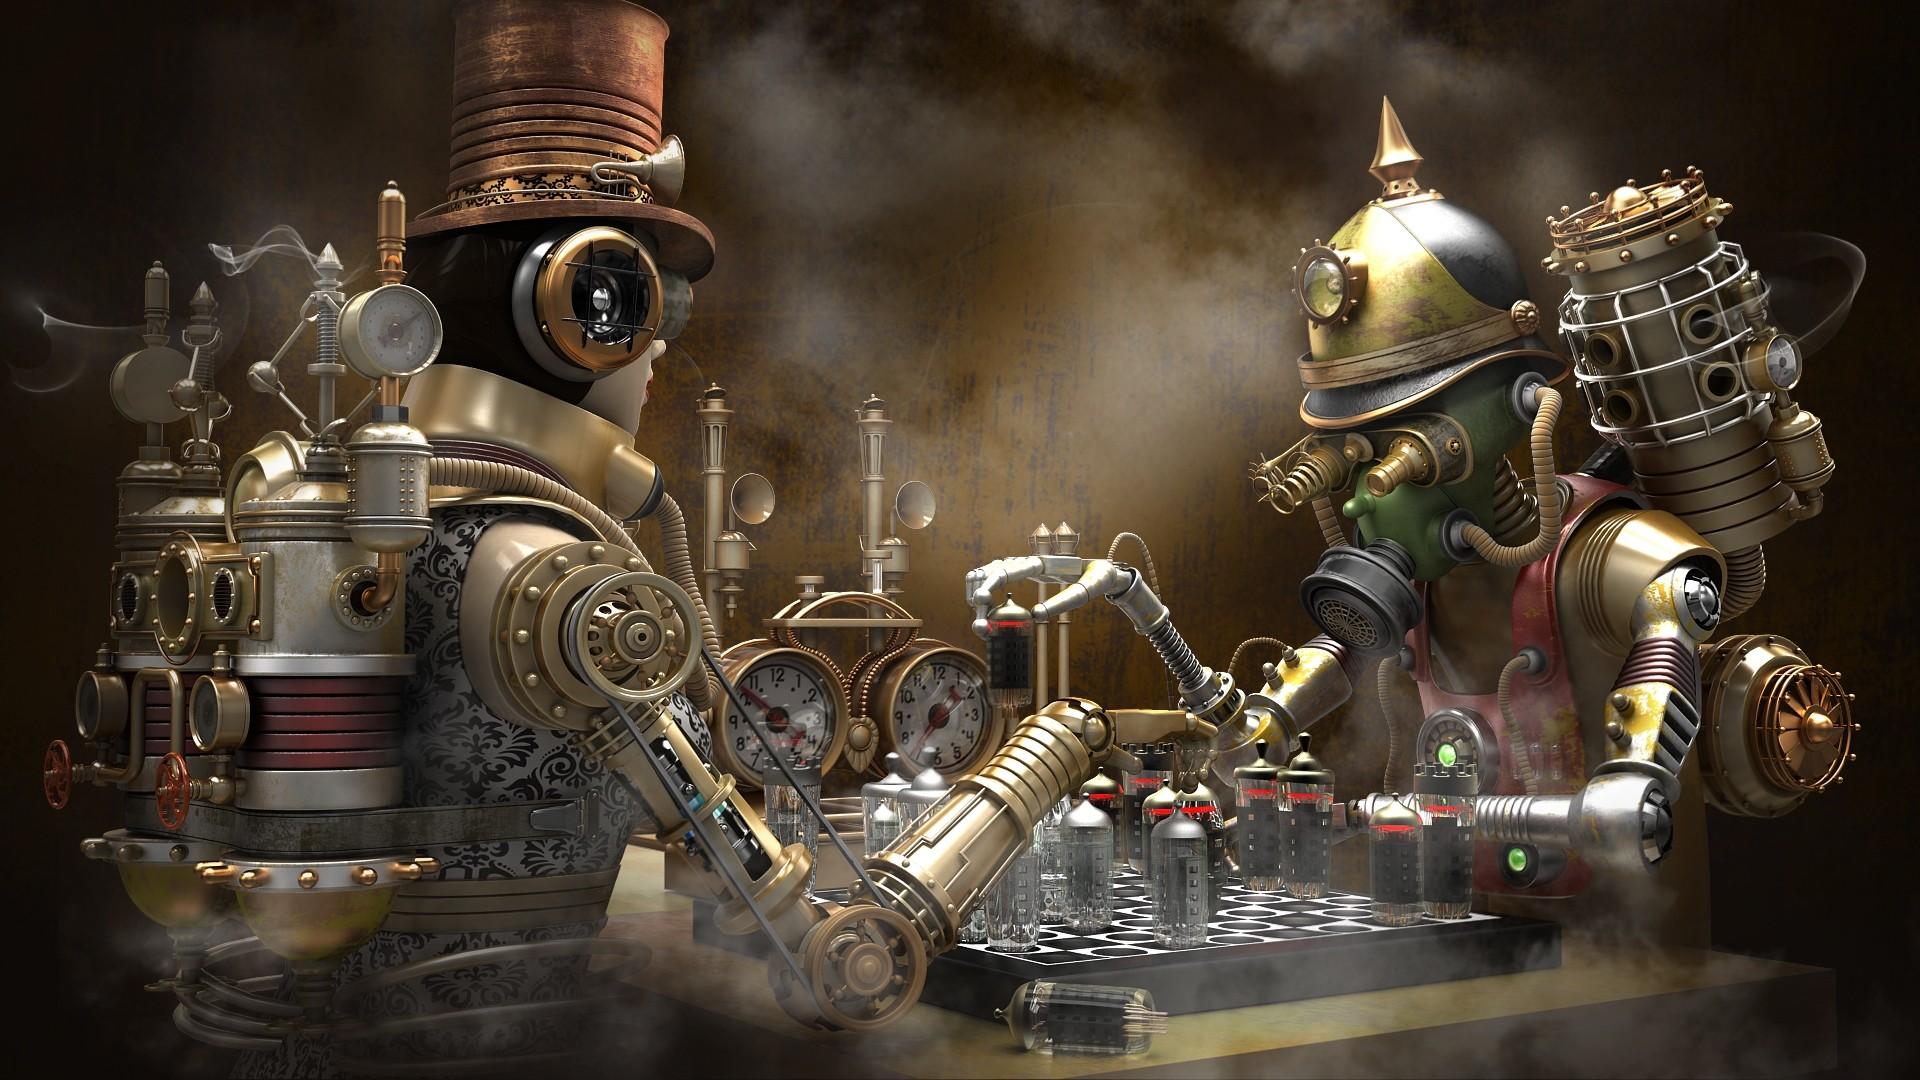 Steampunk Wallpaper image hd